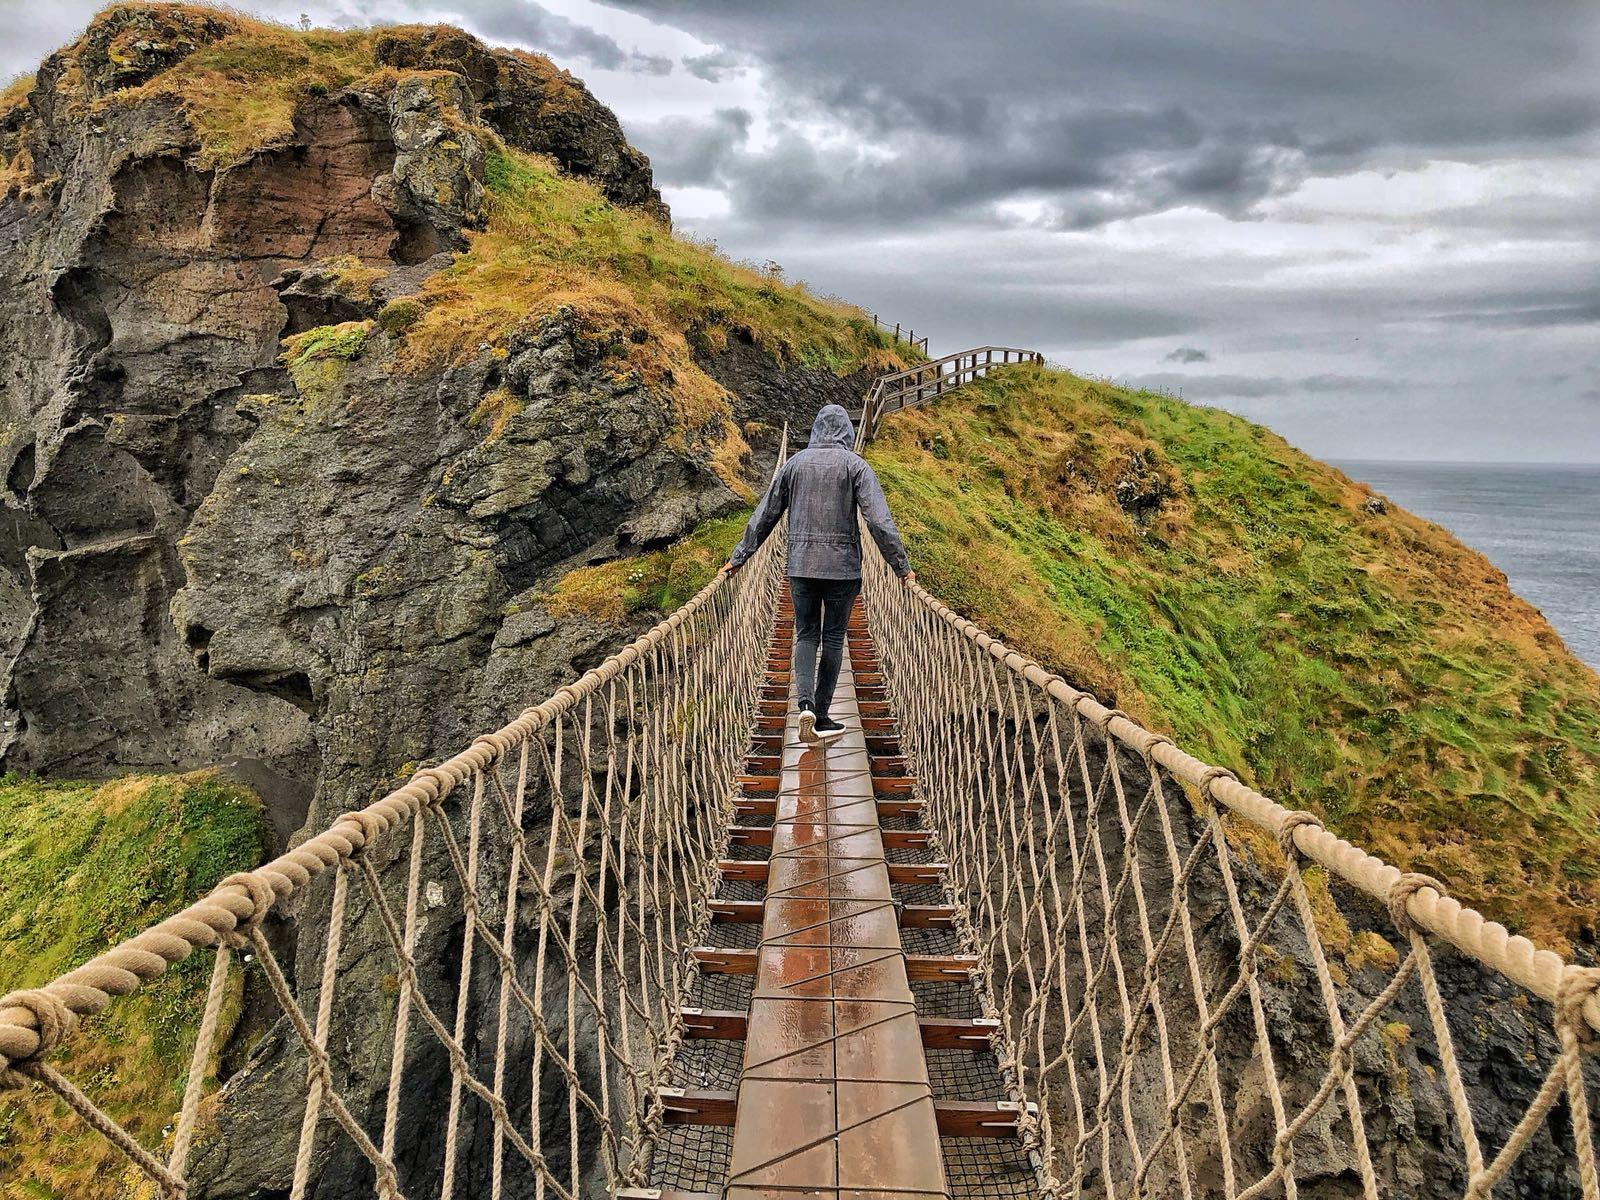 Carrick-a-Rede Bridge - Antrim, Northern Ireland